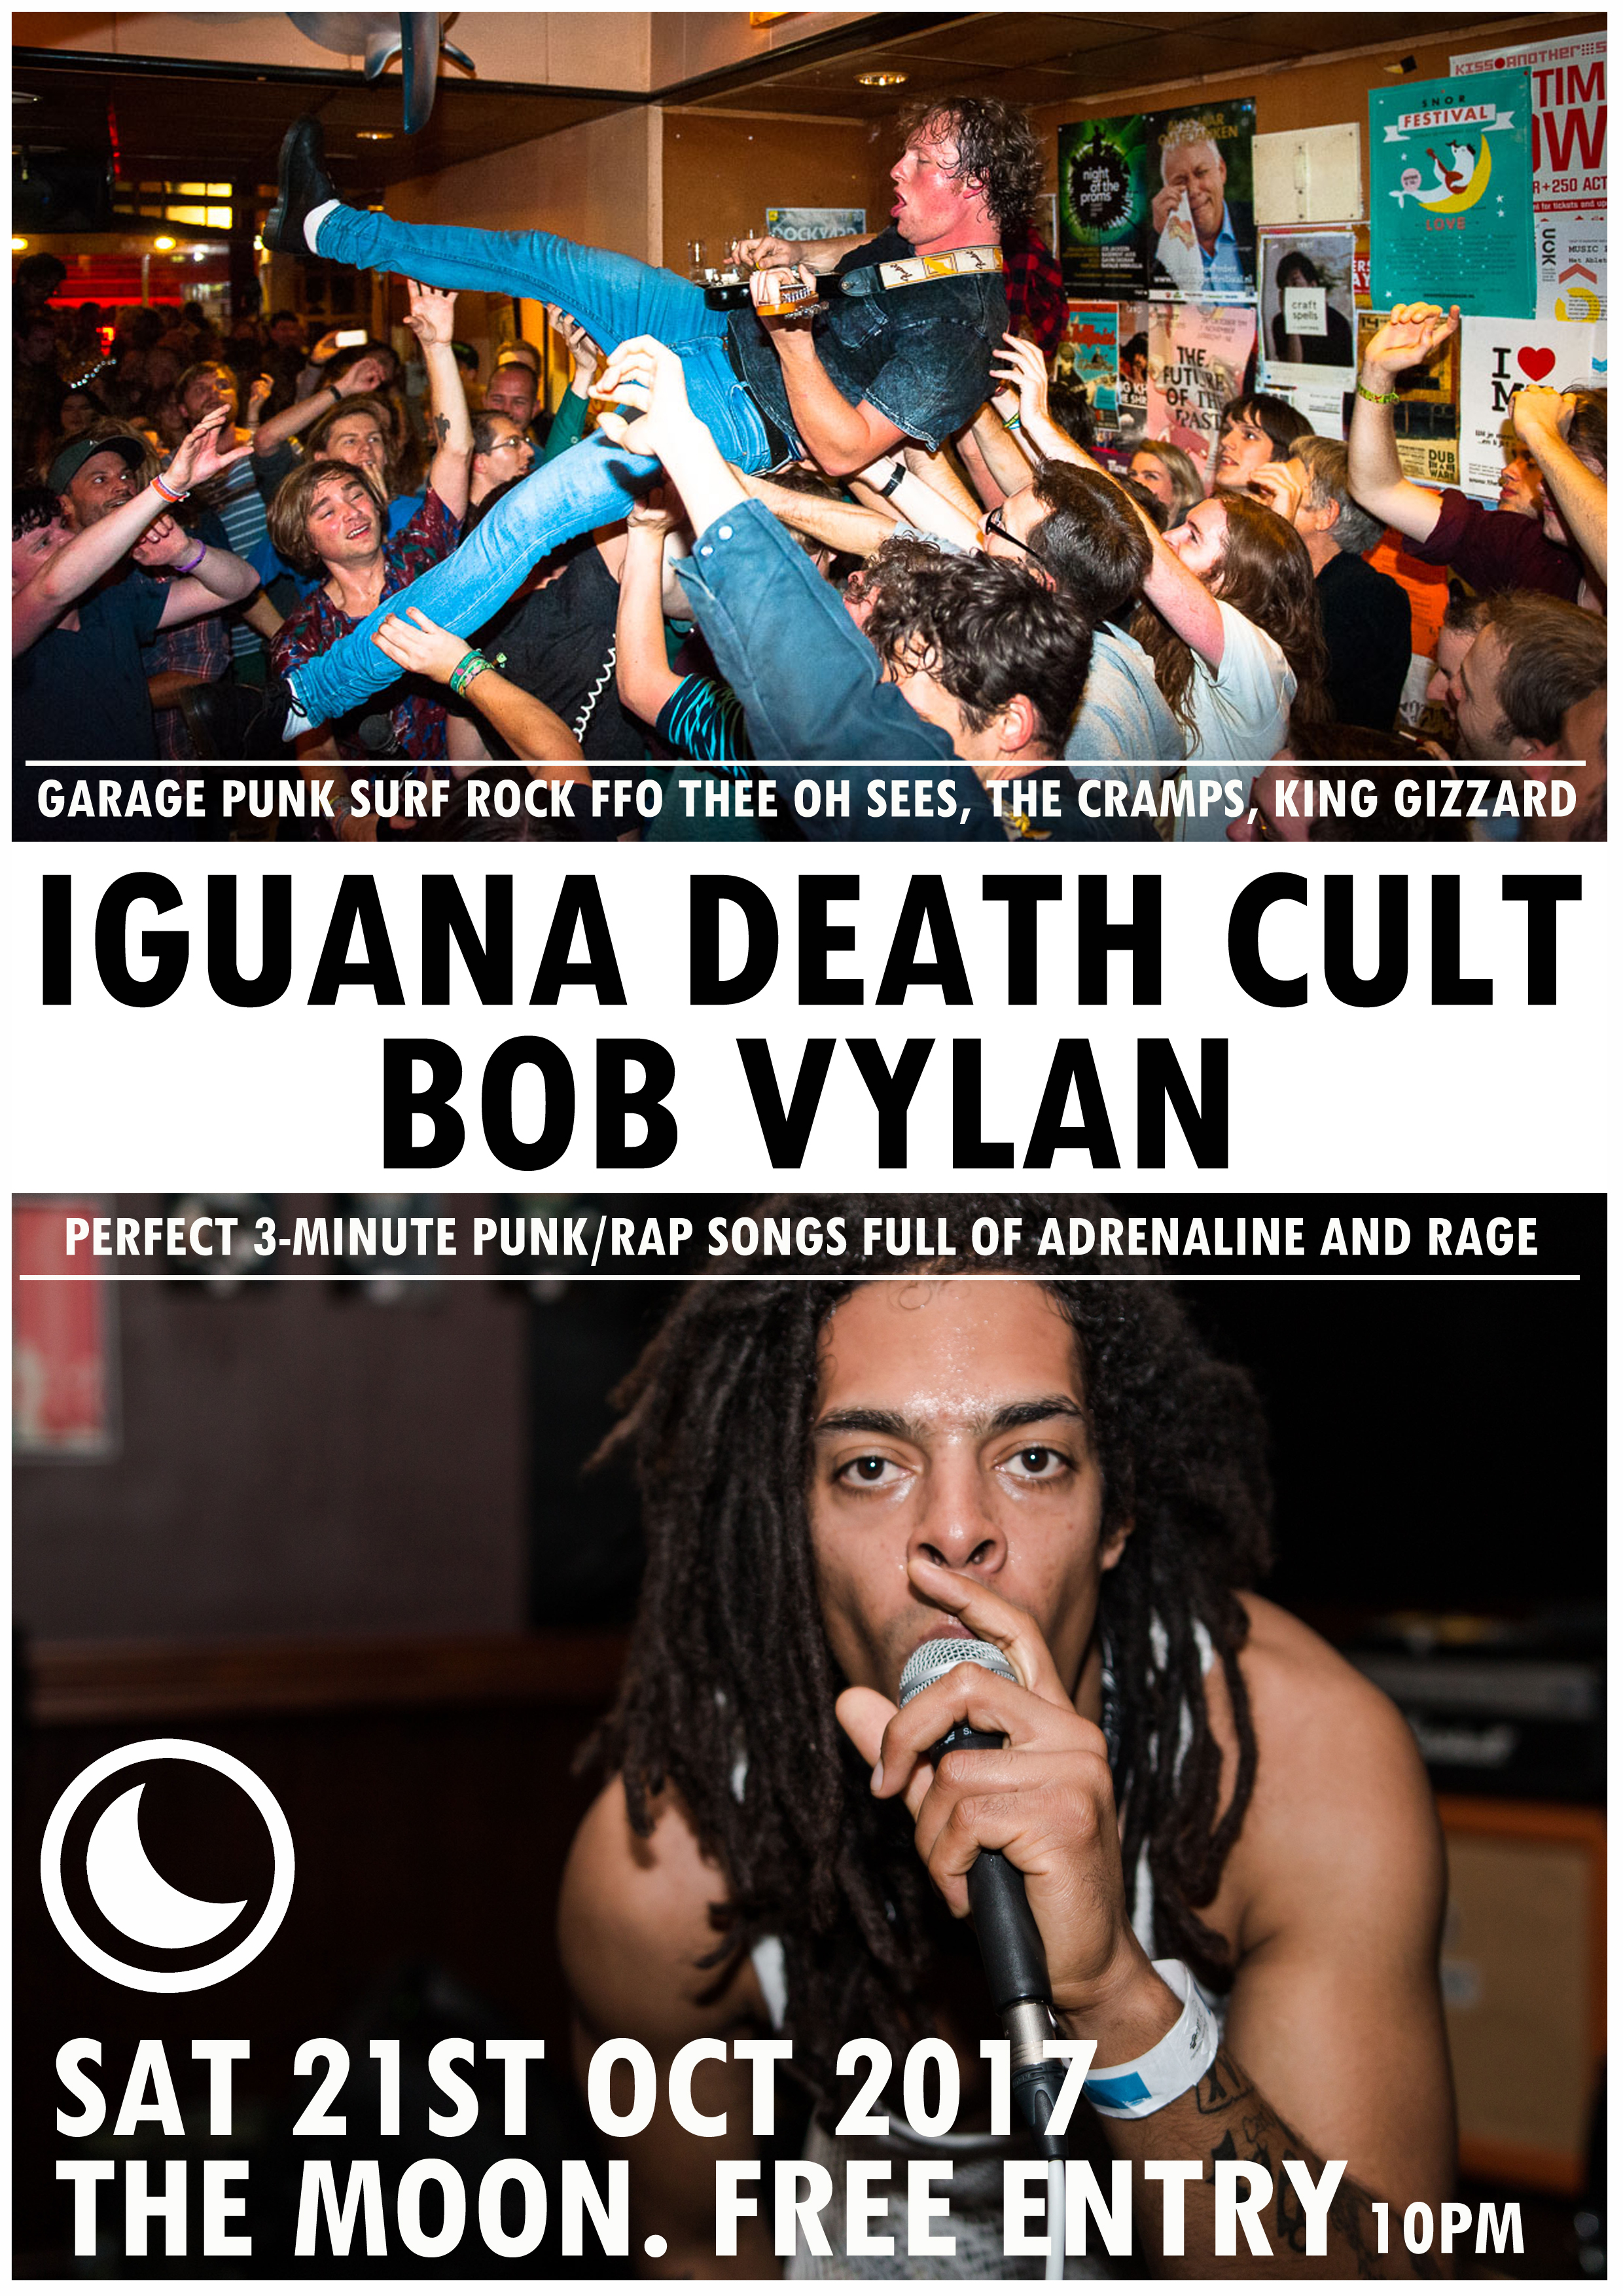 Iguana Death Cult / Bob Vylan